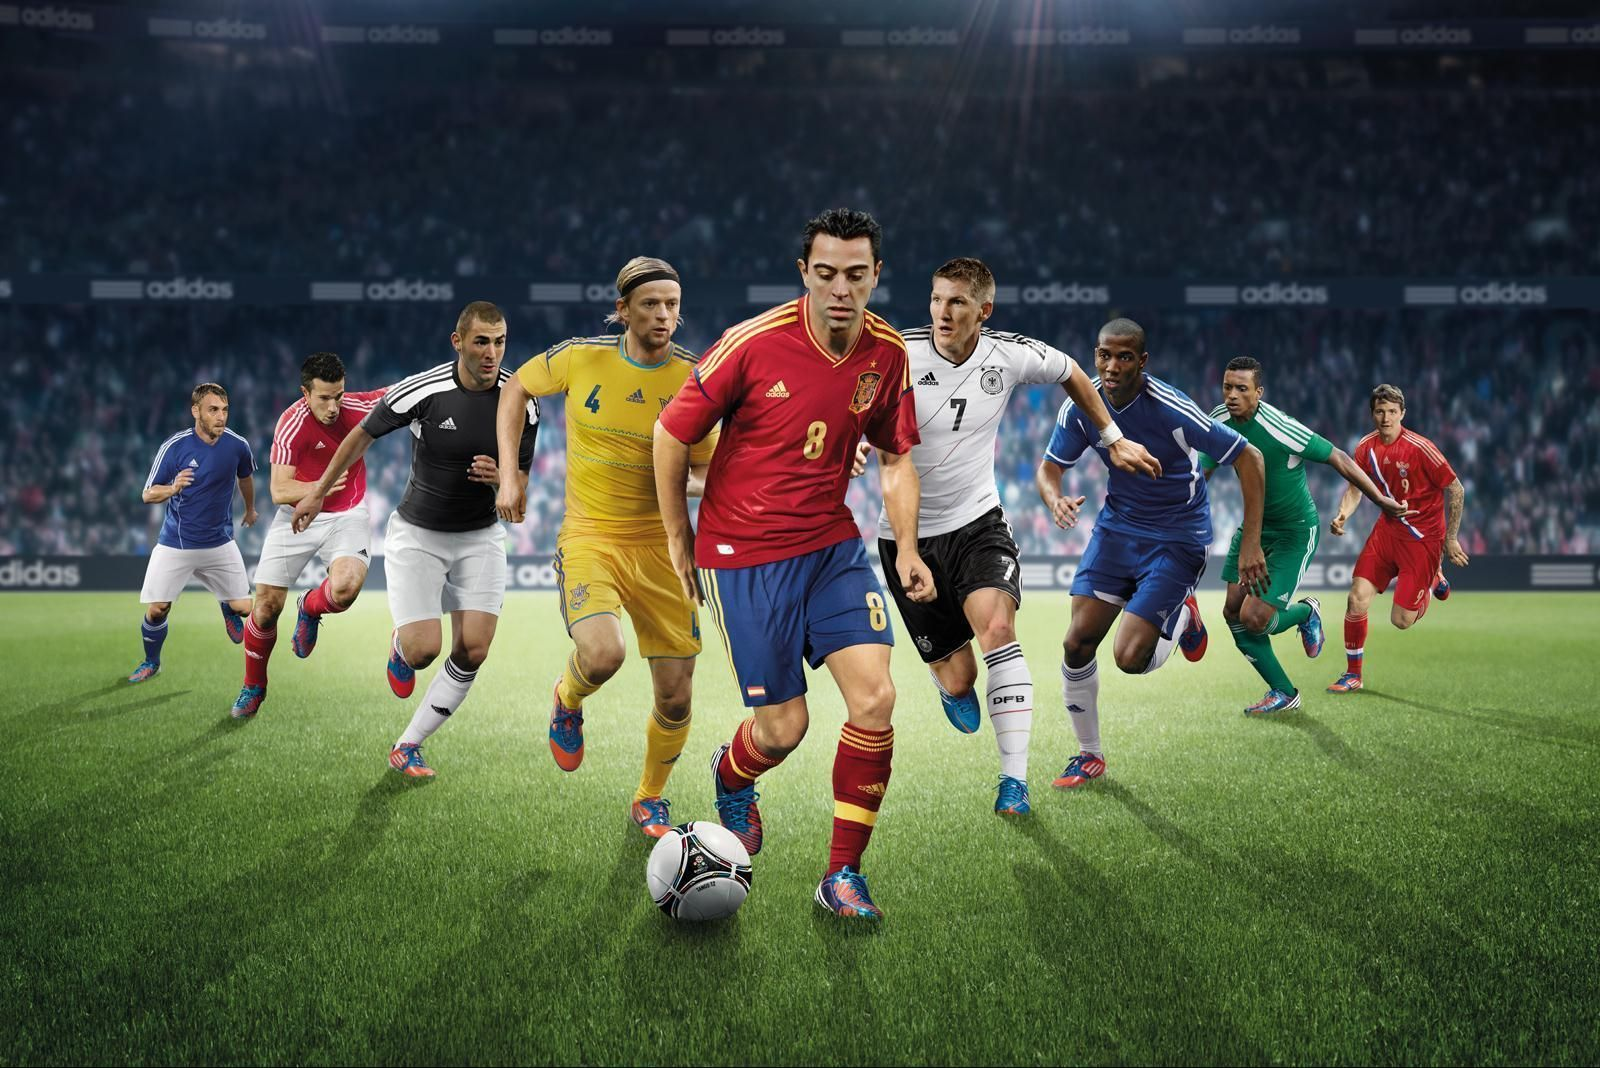 Adidas Soccer Background Is 4k Wallpaper Soccer Soccer Fans Football Wallpaper